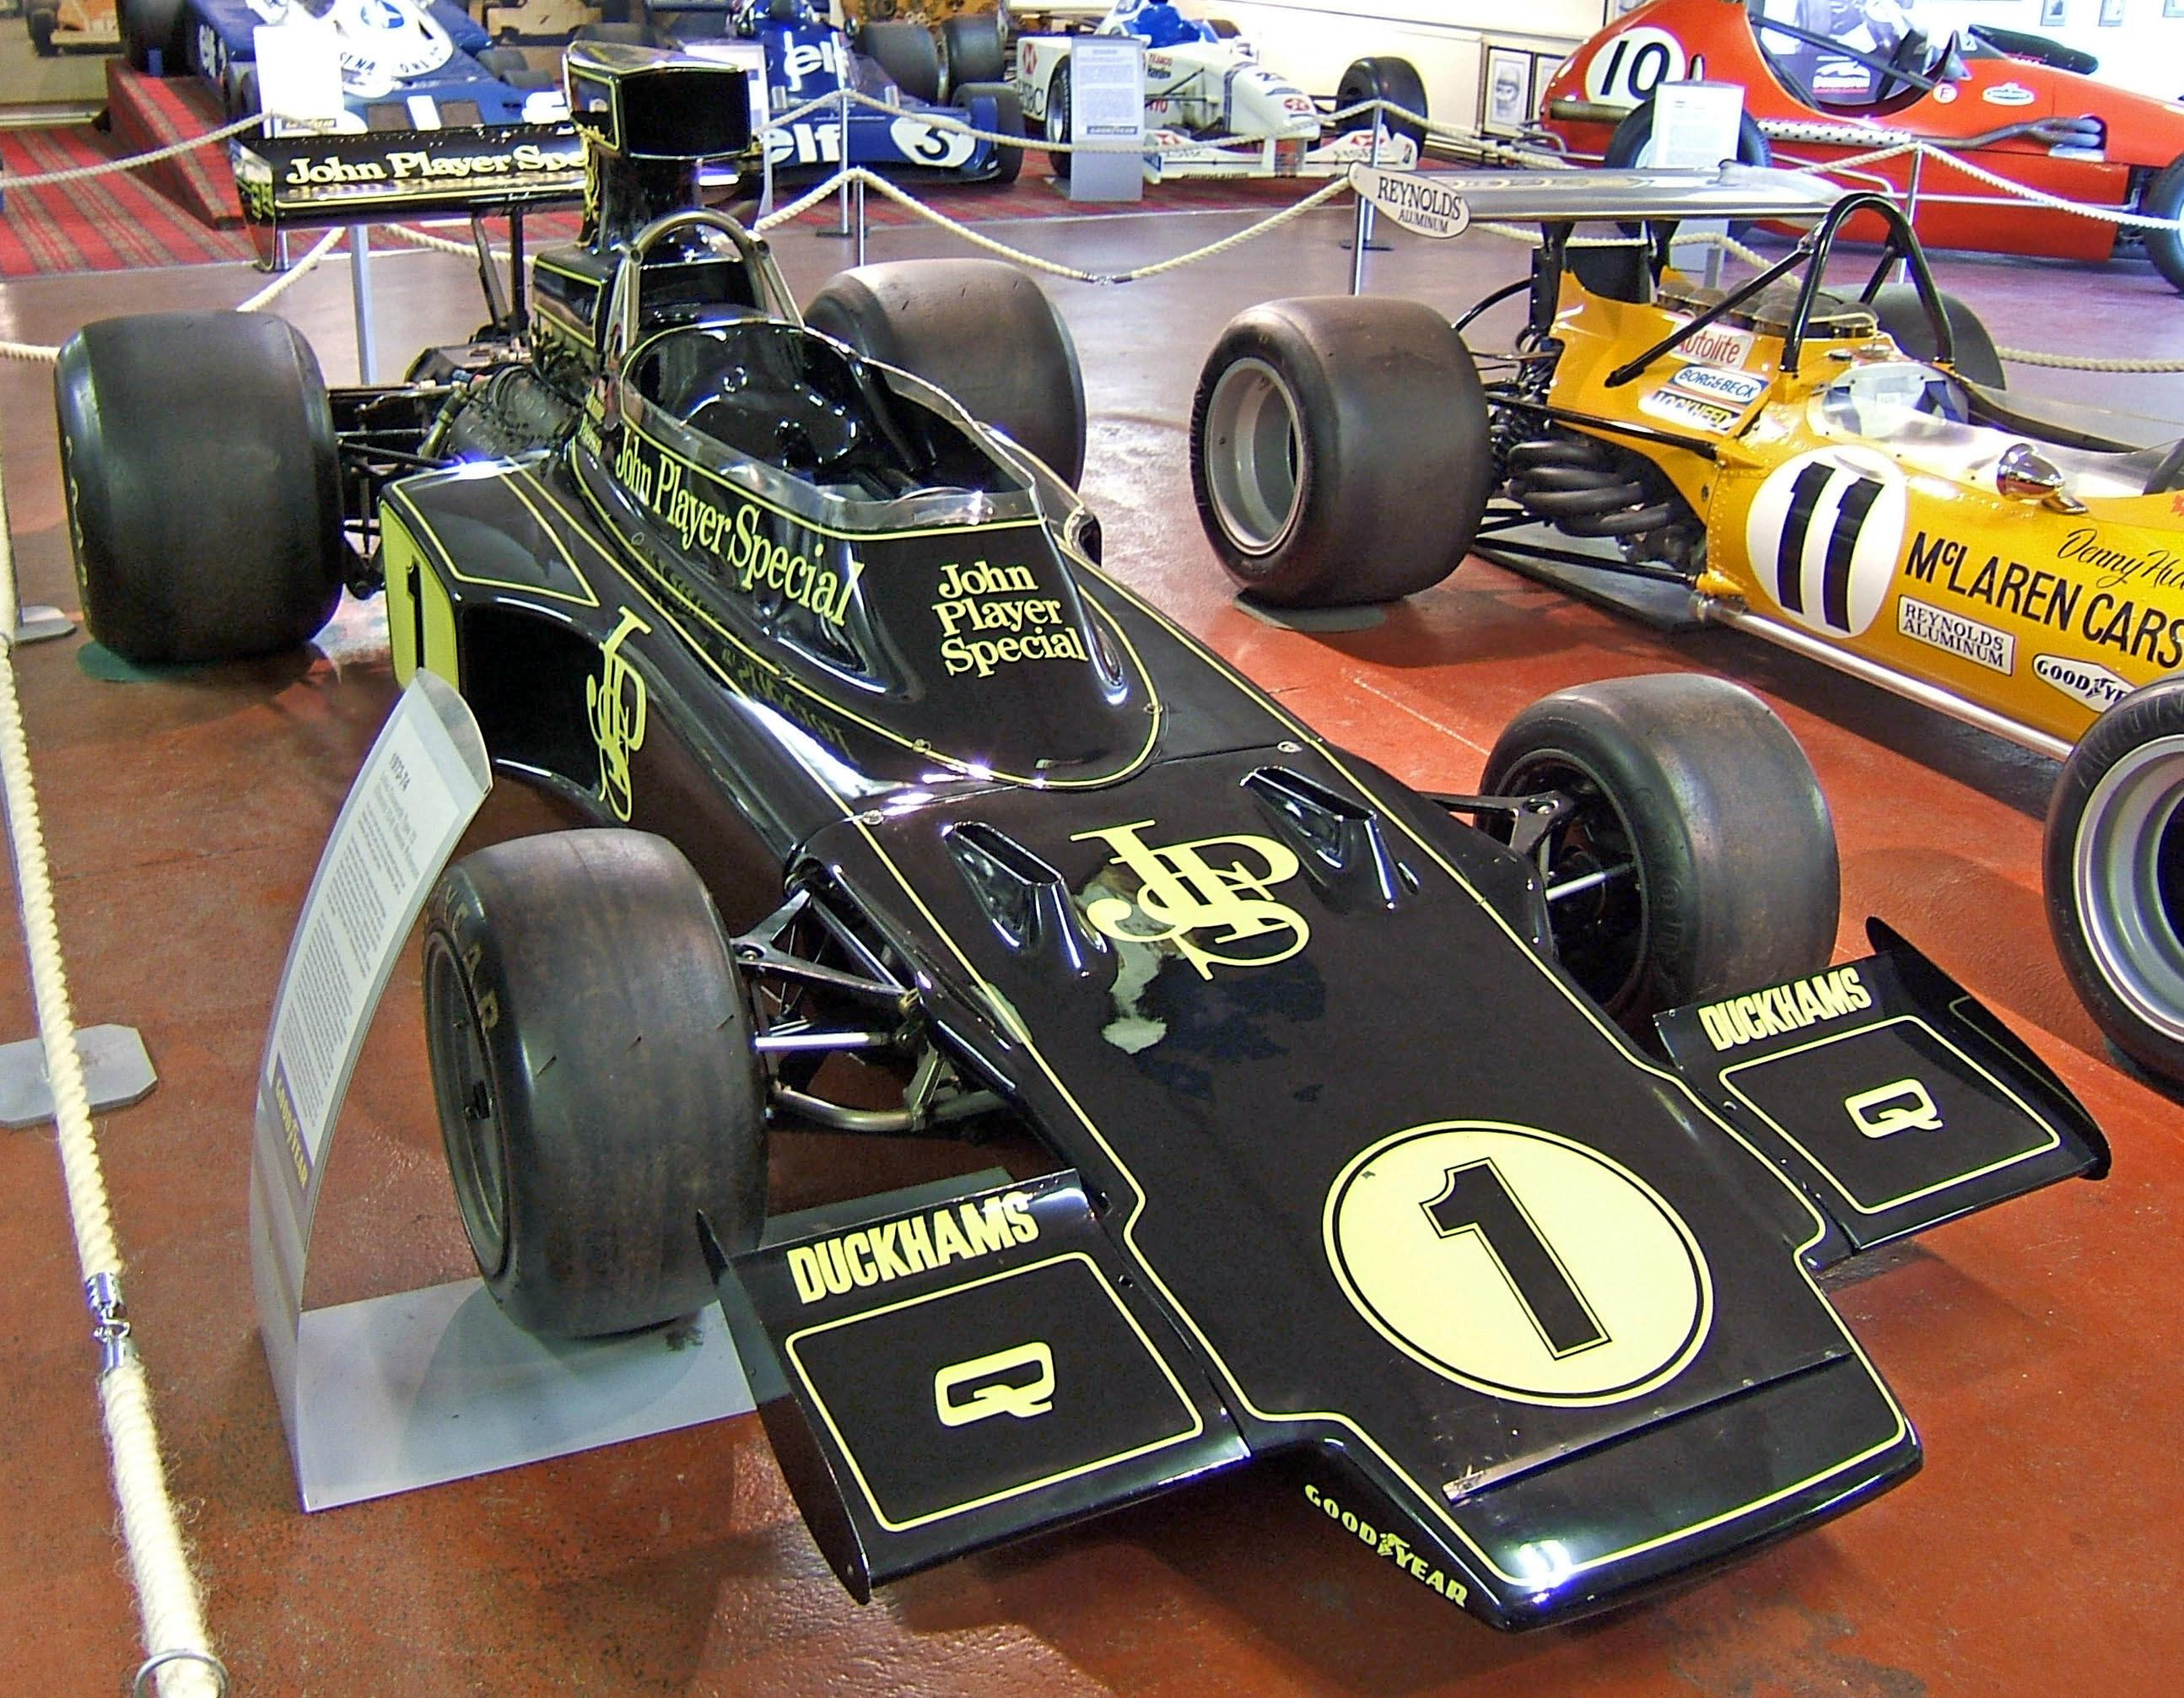 Colin S Classic Cars